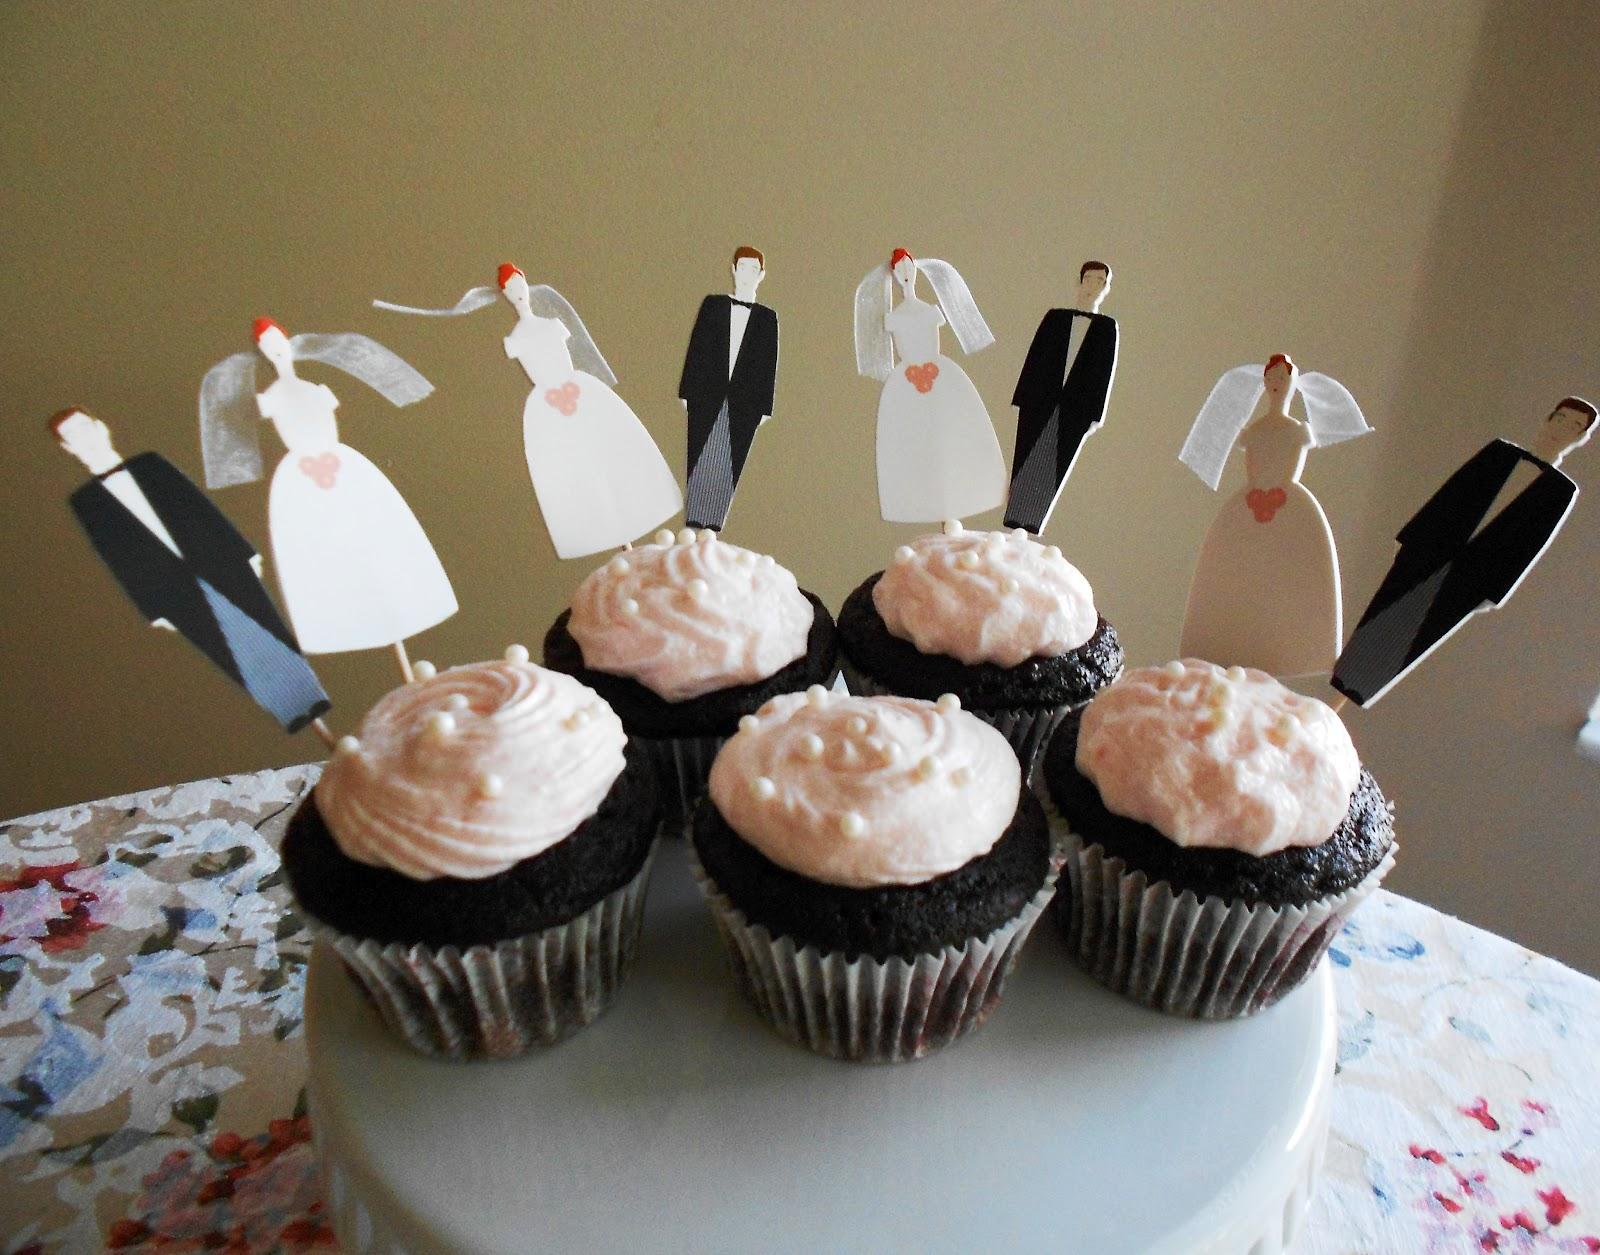 ... cupcakes, a million cupcake photos, art of cupcakes, recipes of